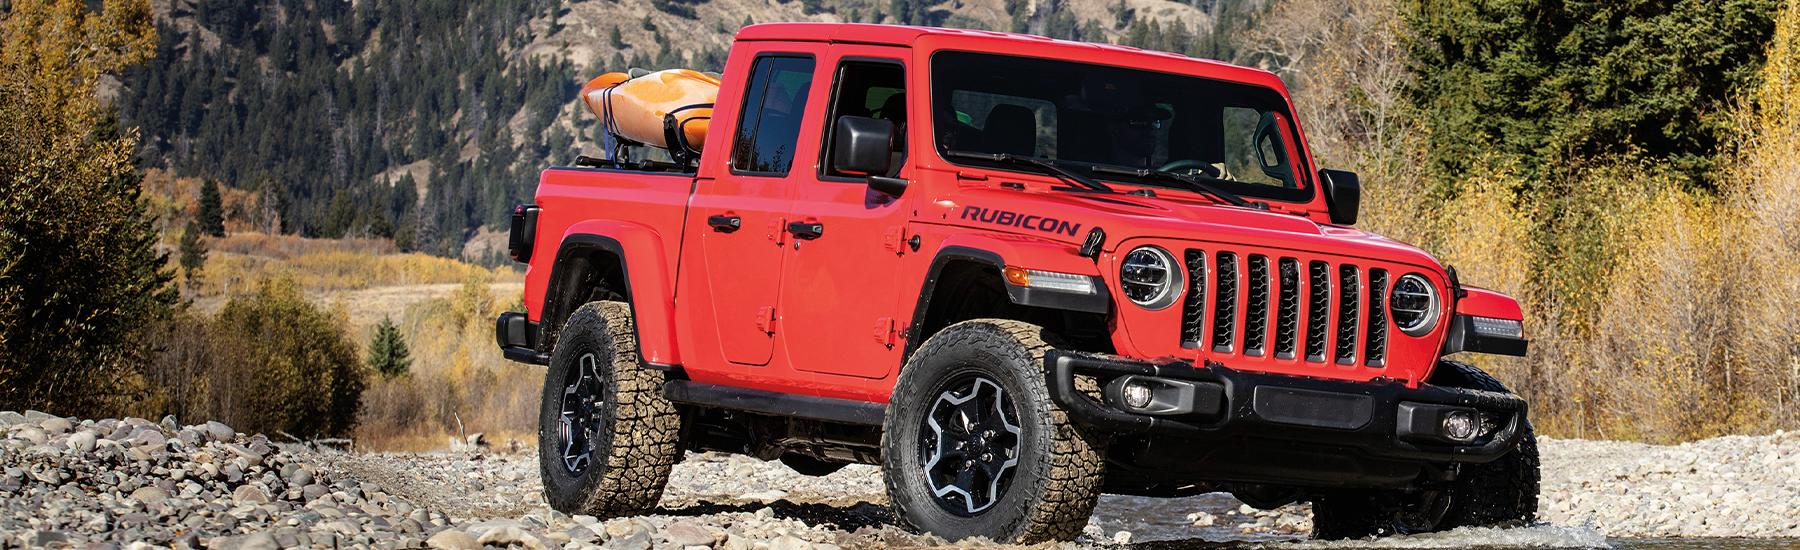 Huntington Beach Cdjr >> Orange Coast Chrysler Dodge Jeep Ram Fiat Dealer In